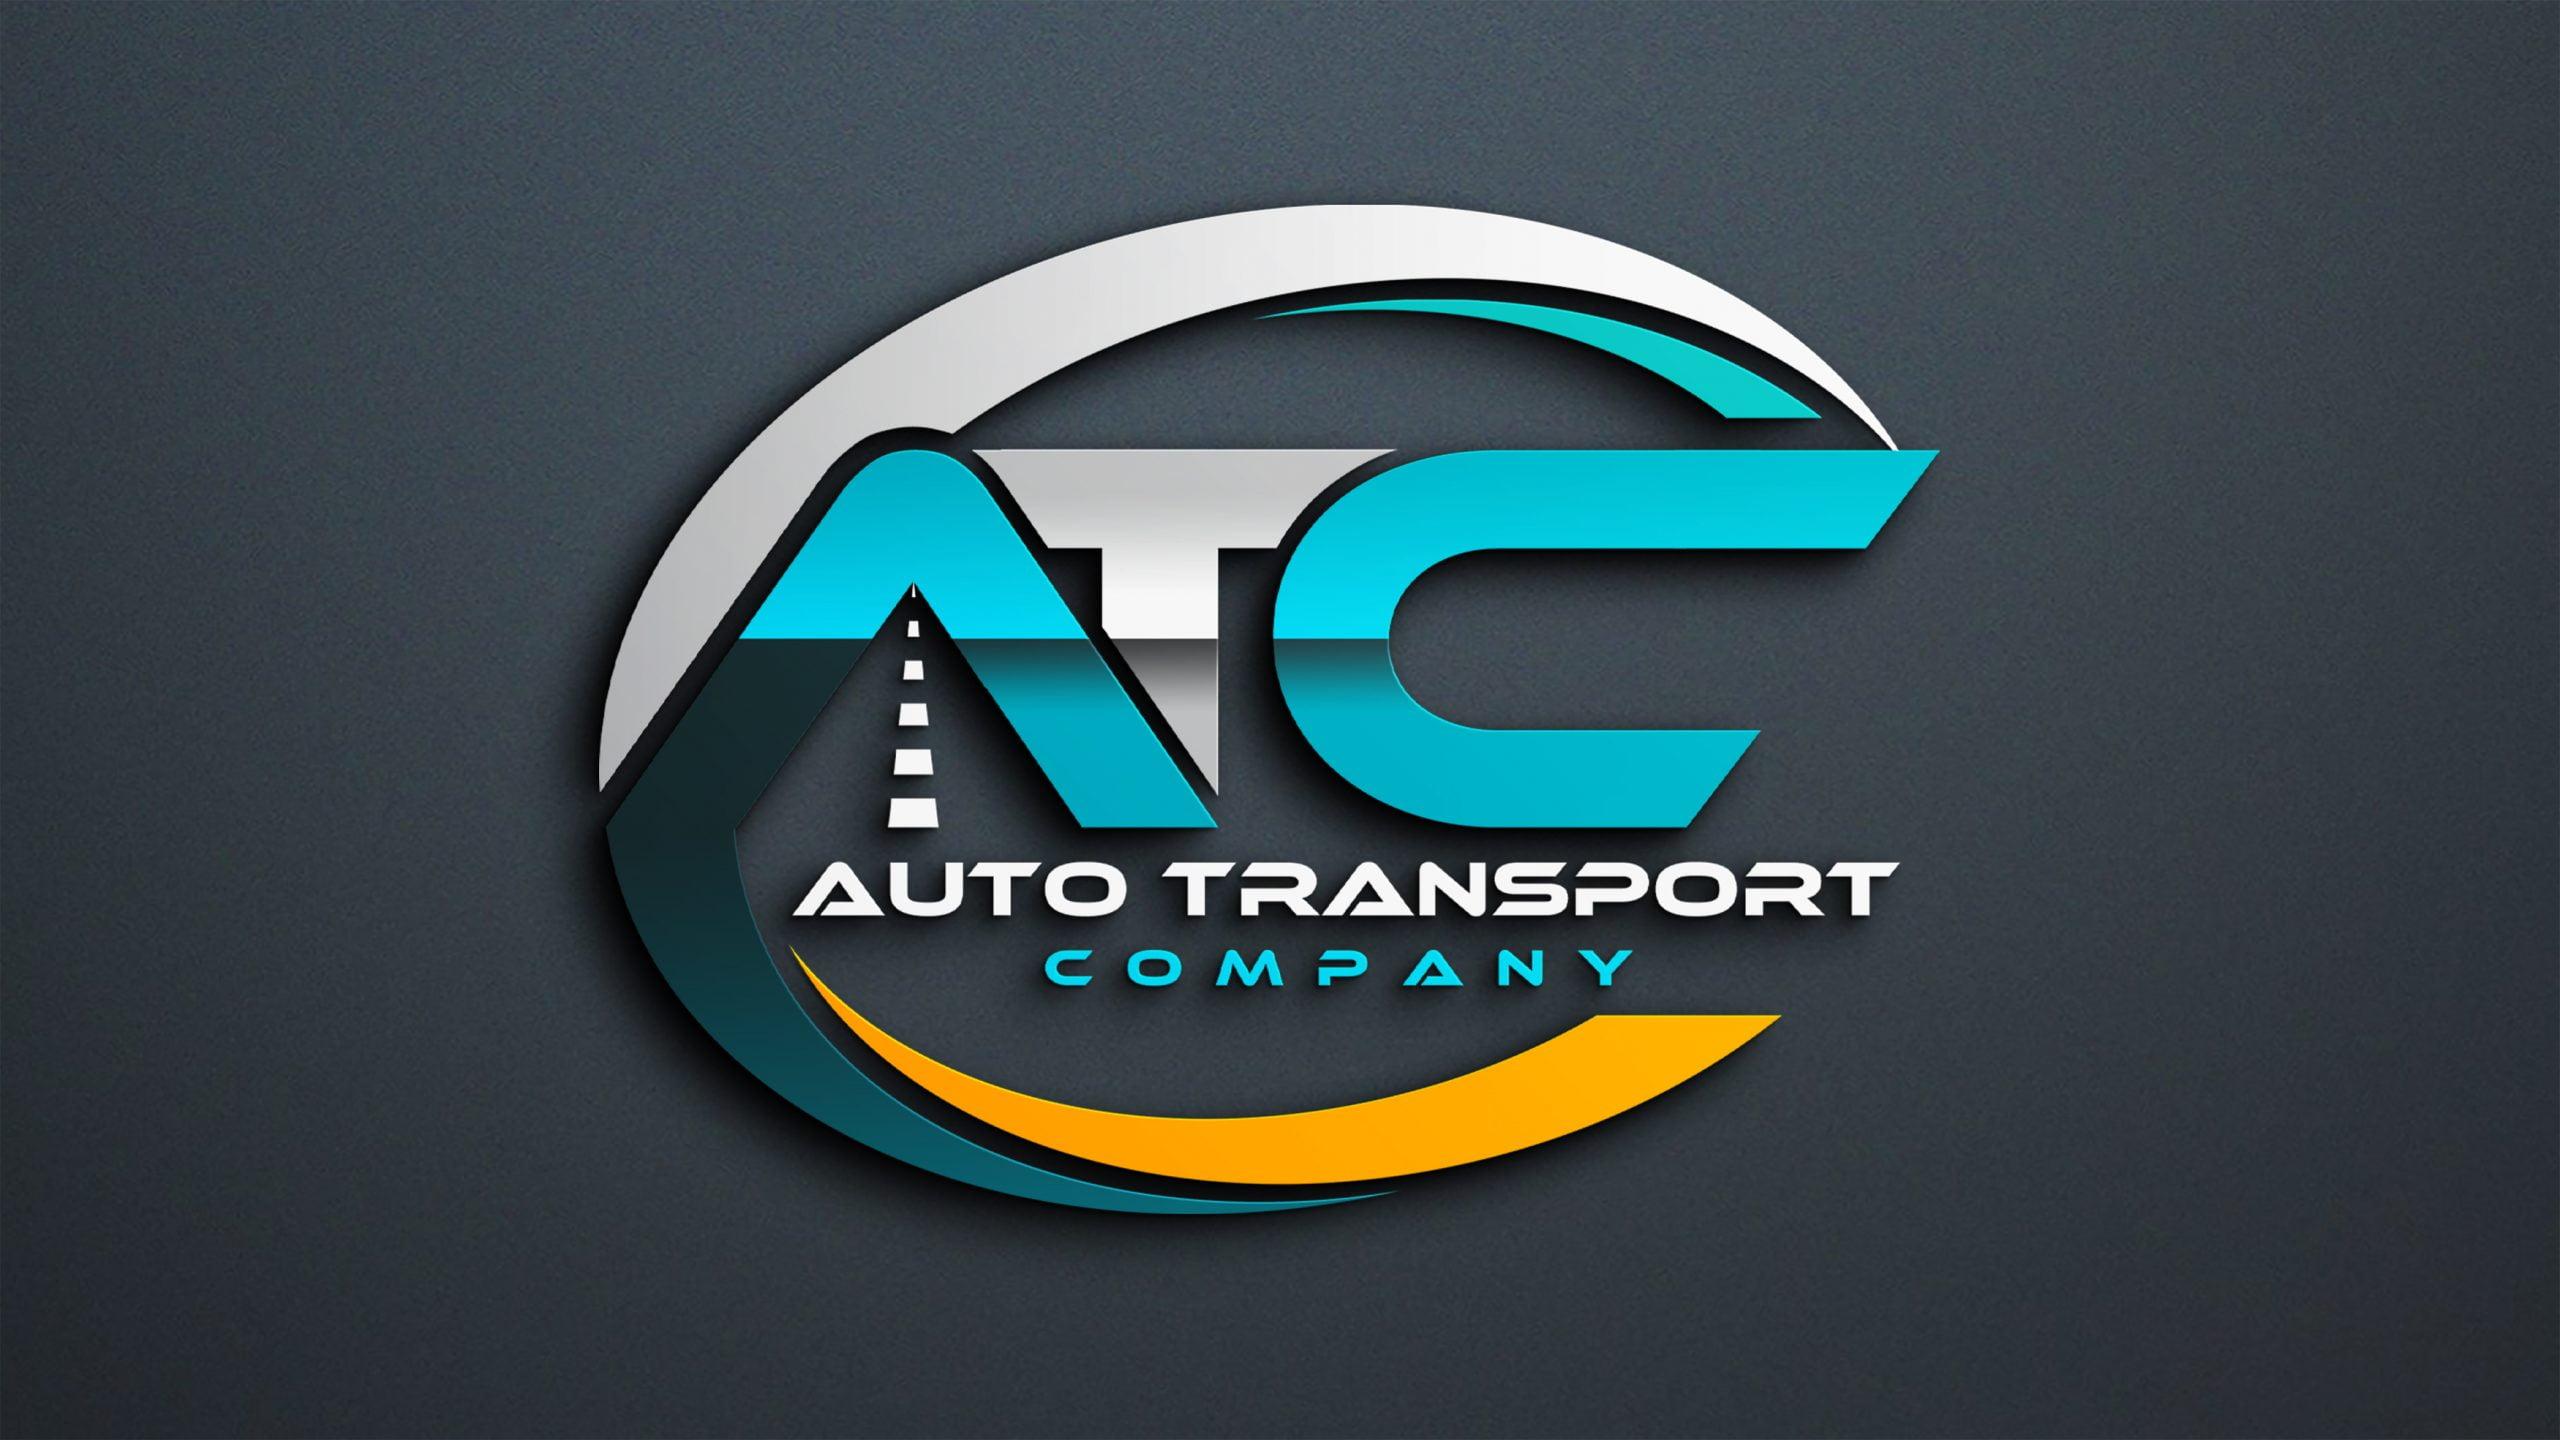 Transport Company Logo Design PSD Download